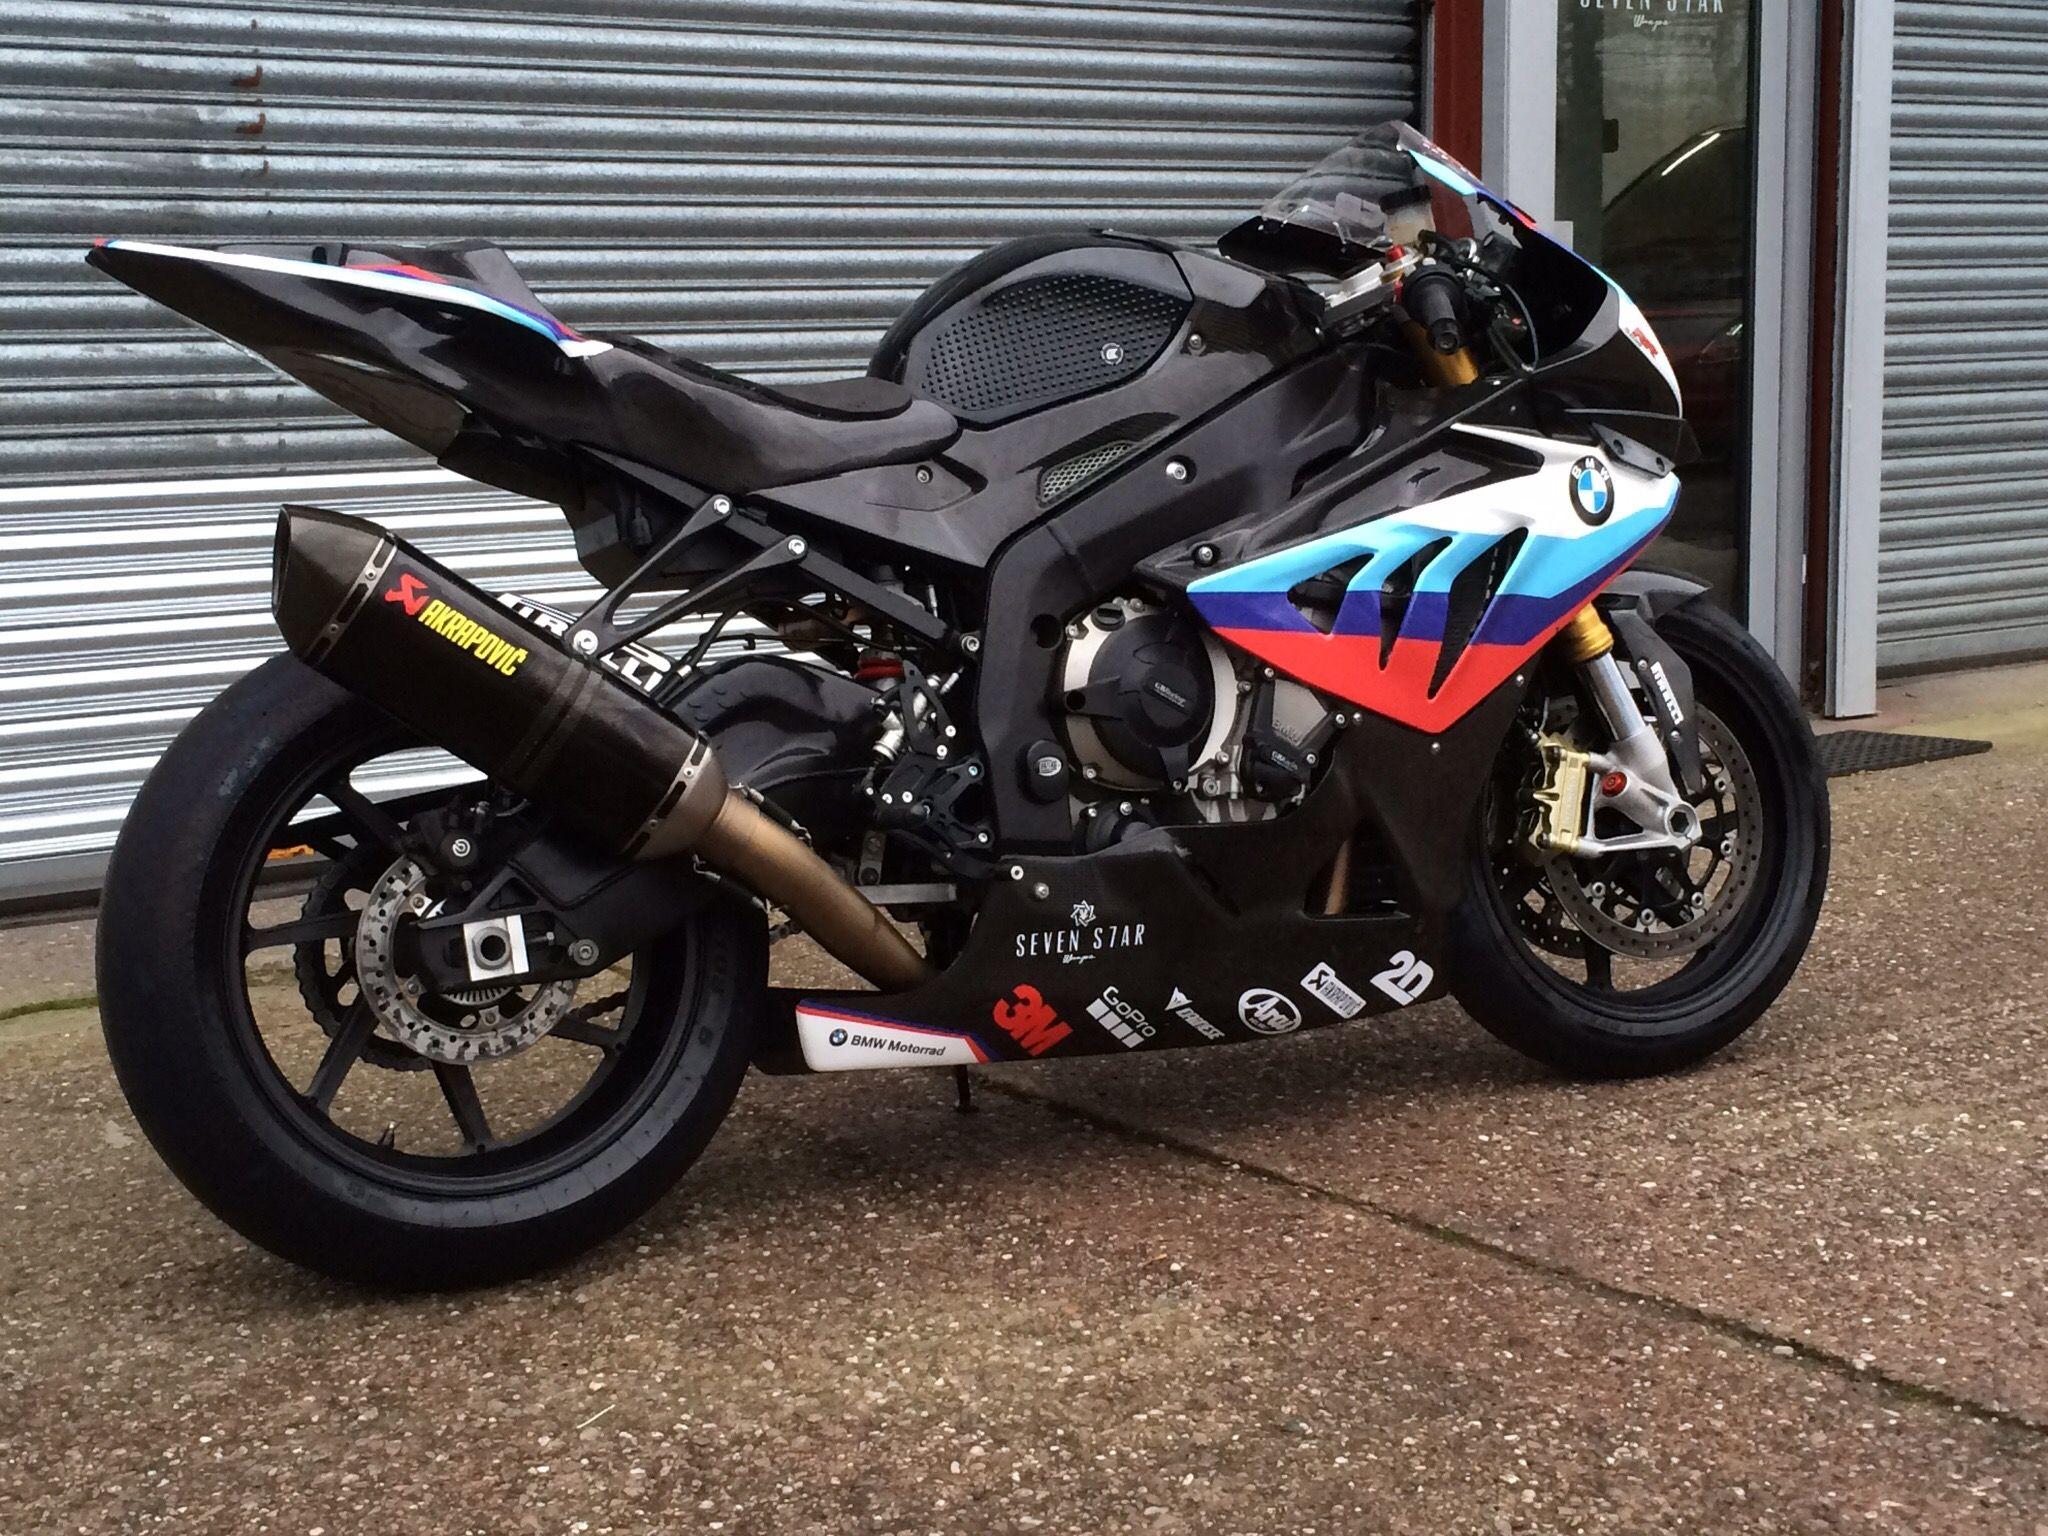 Bmw S1000rr Custom Race Wrap And Decals Design Bmw S1000rr Bike Bmw Bmw Motorcycles